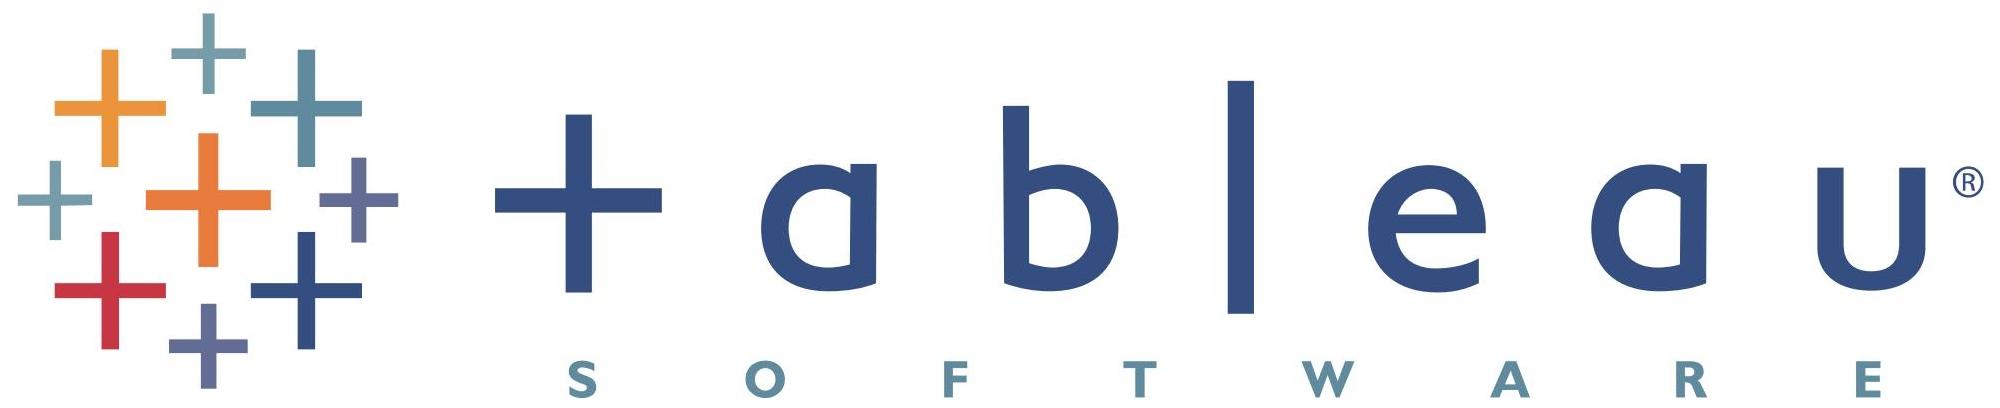 tableau-logo.jpg